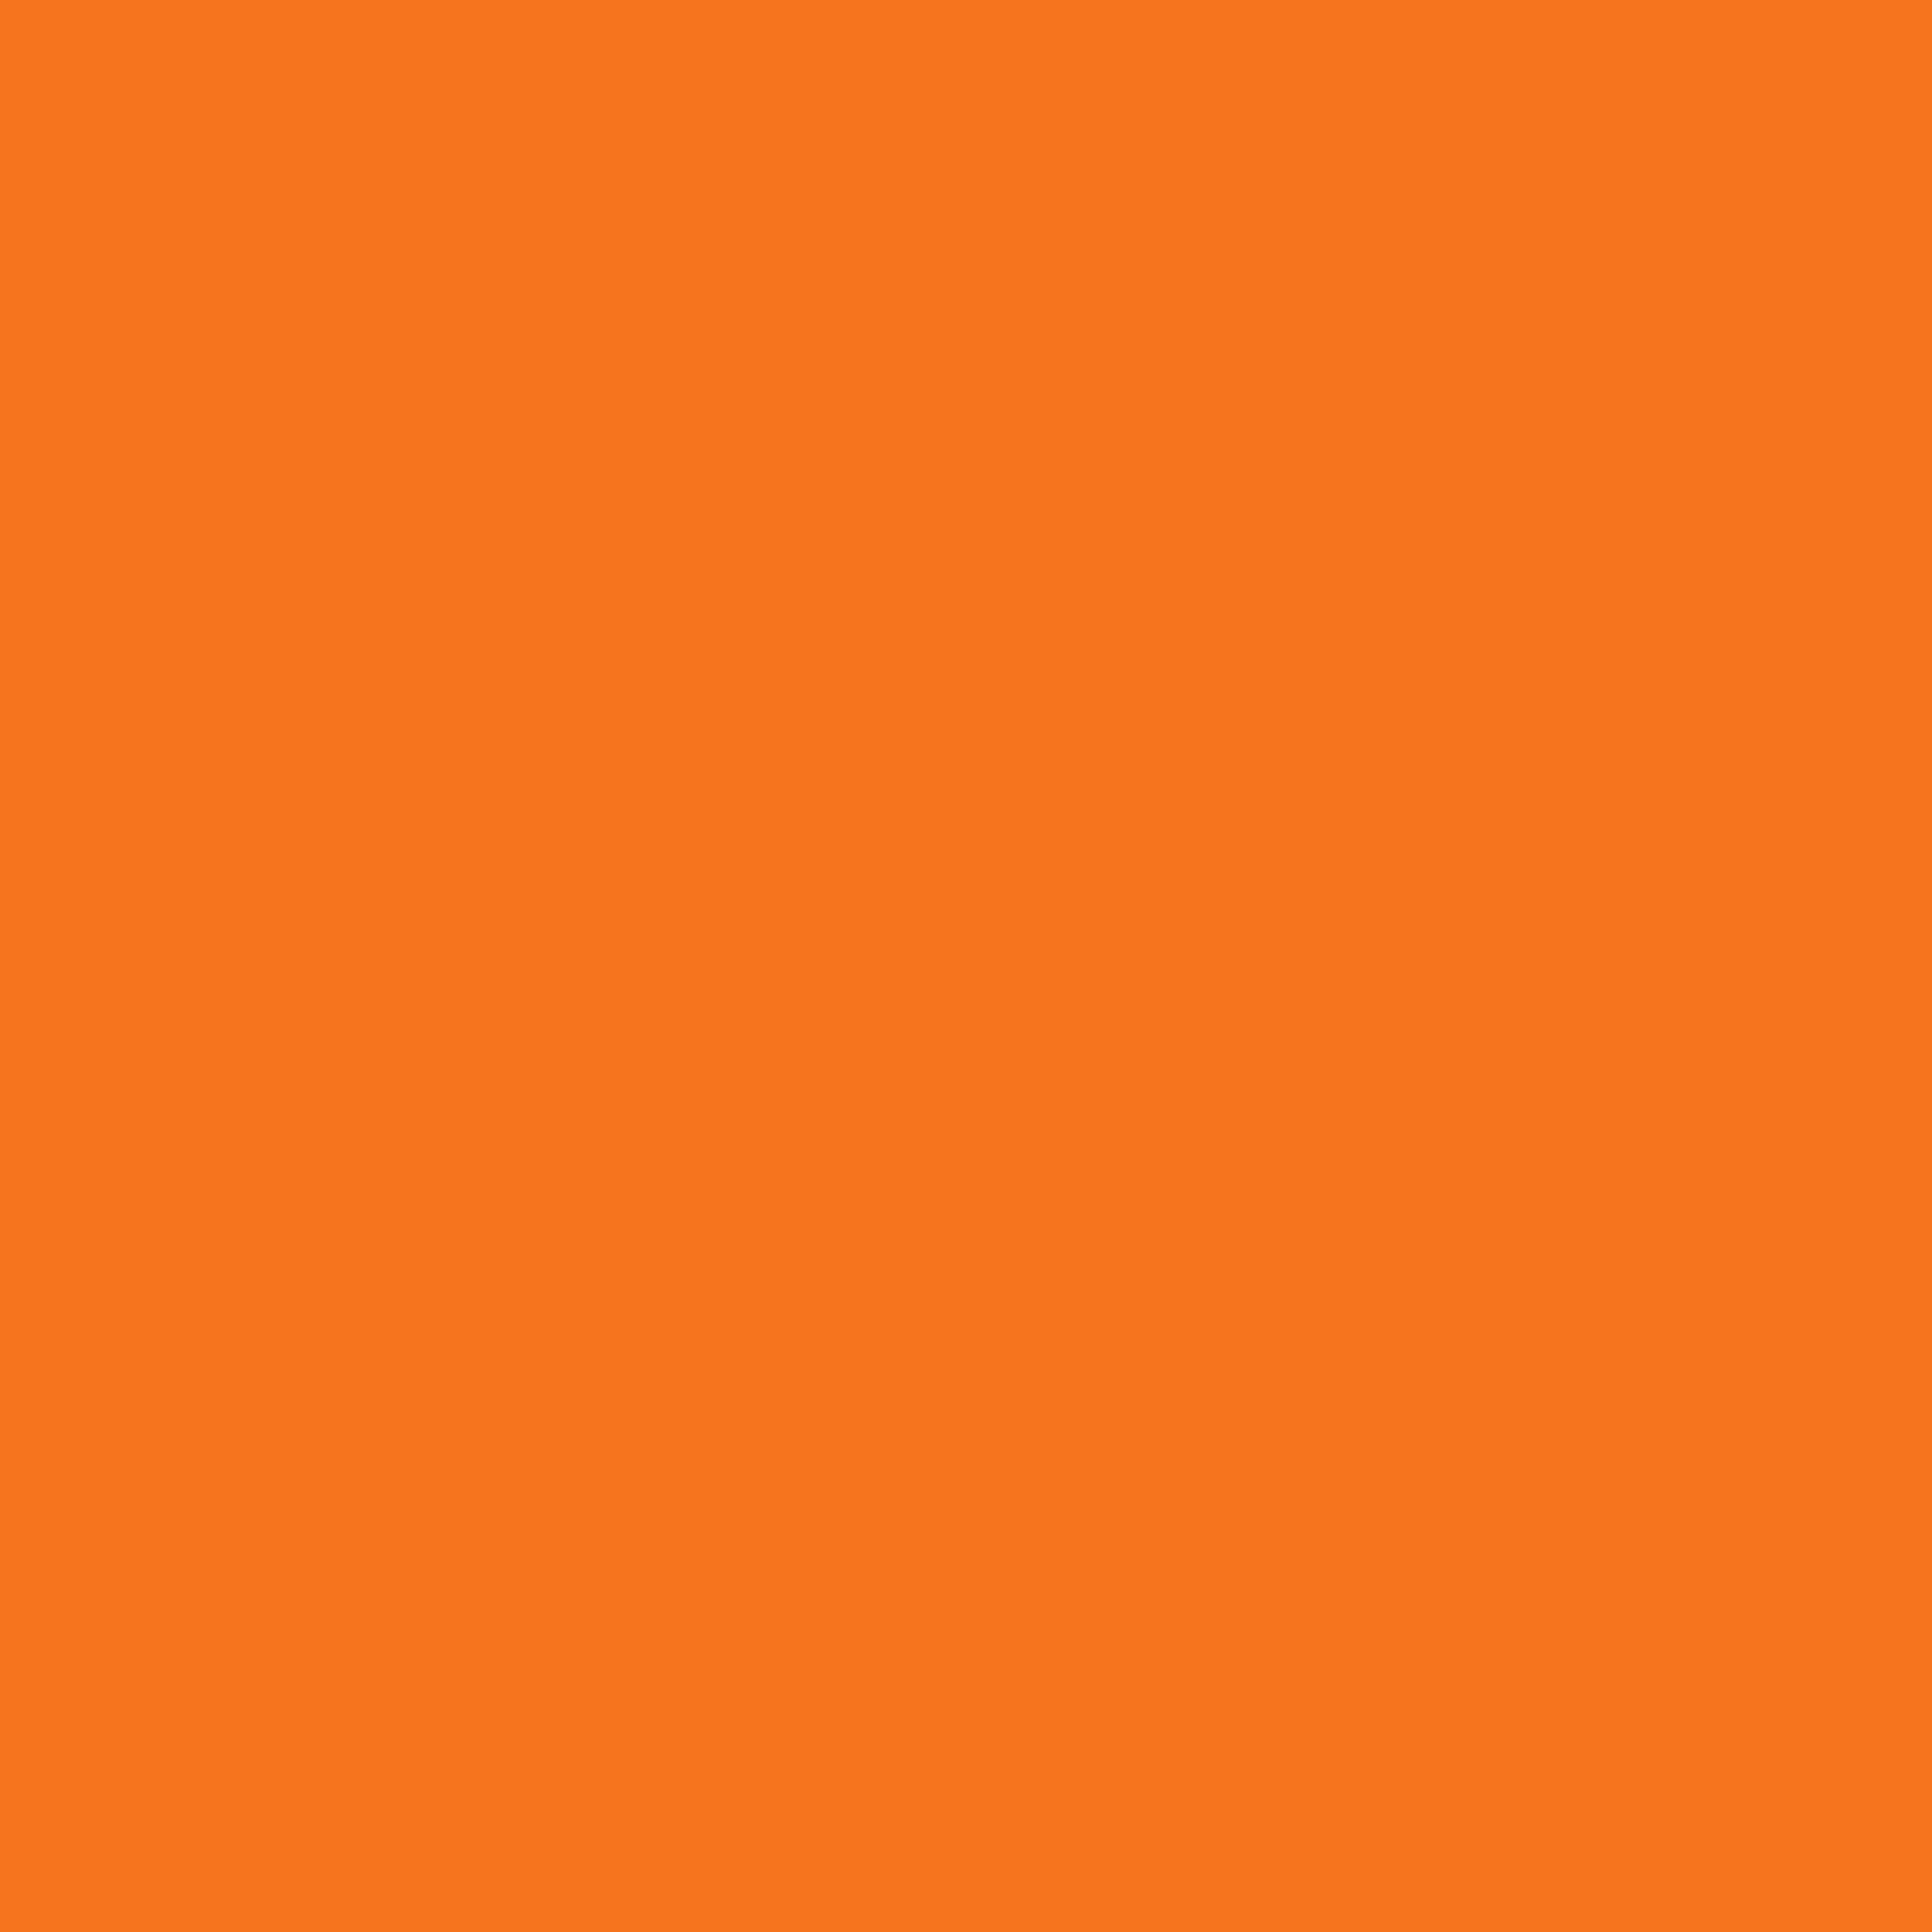 spaceistheplace_210922_SitP4_einzeln_4_transparenter-hg